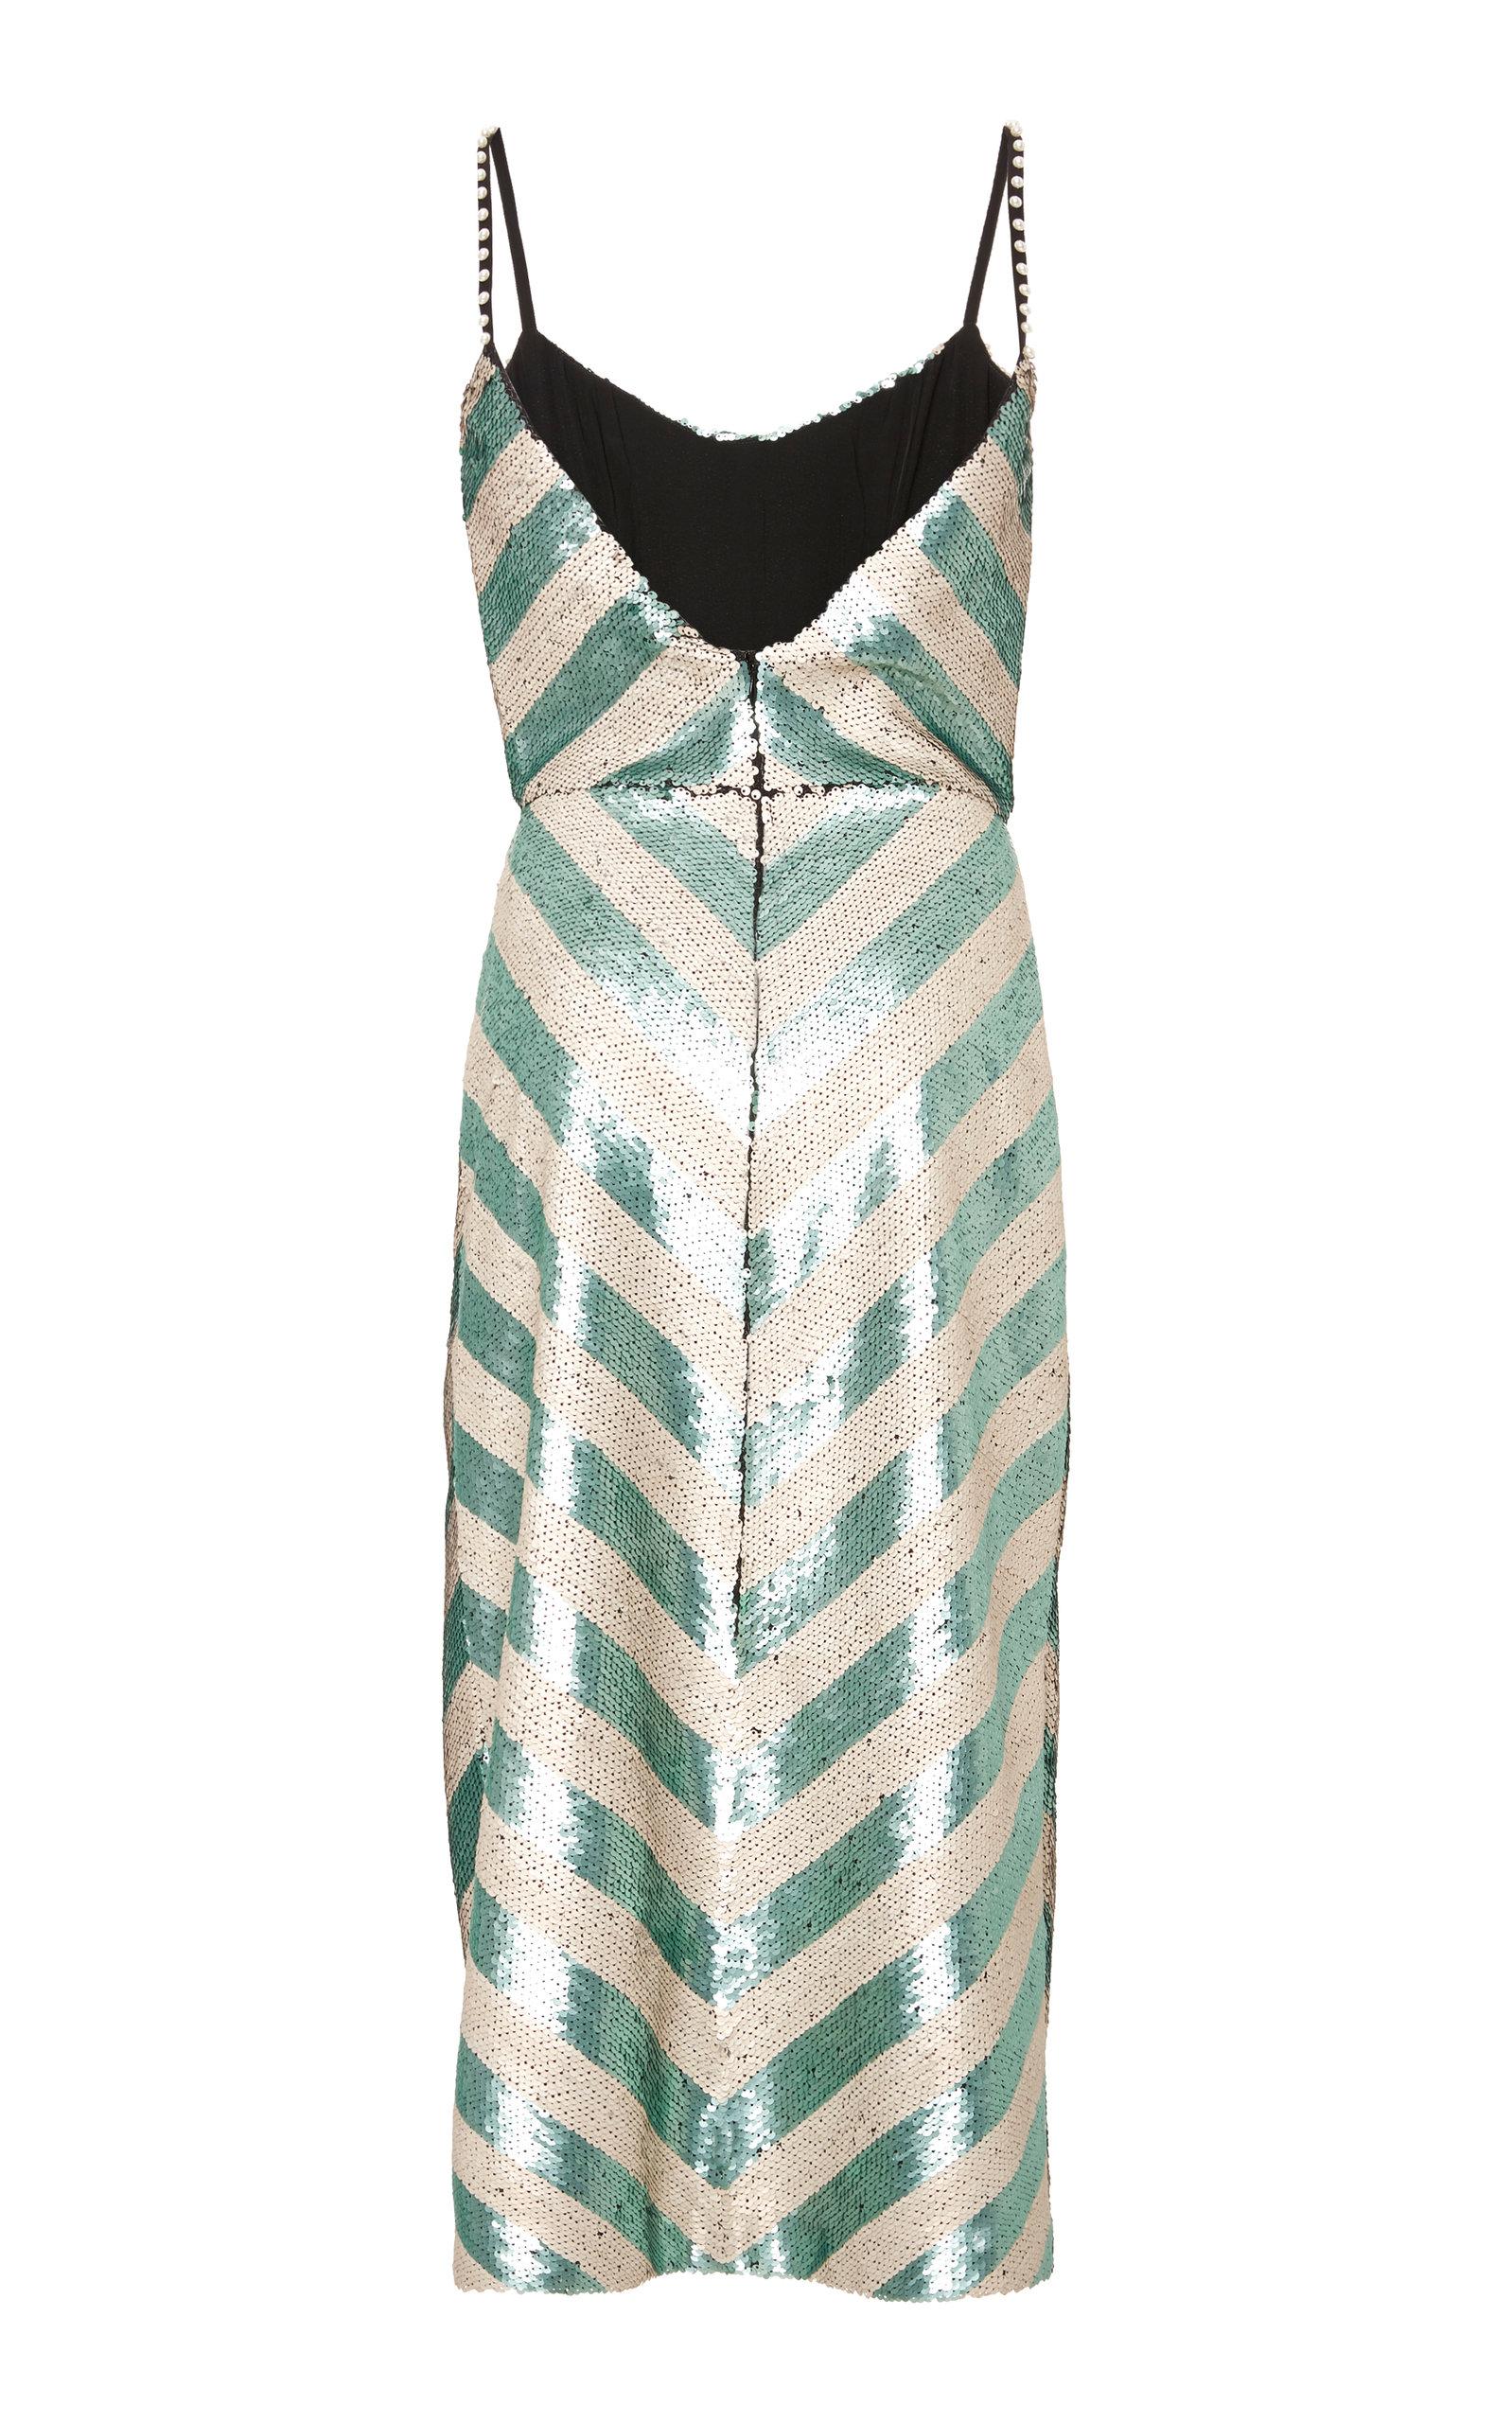 MO Exclusive Salon De Paris Sequin Dress Johanna Ortiz Cheap Manchester Online For Sale PPLAQ